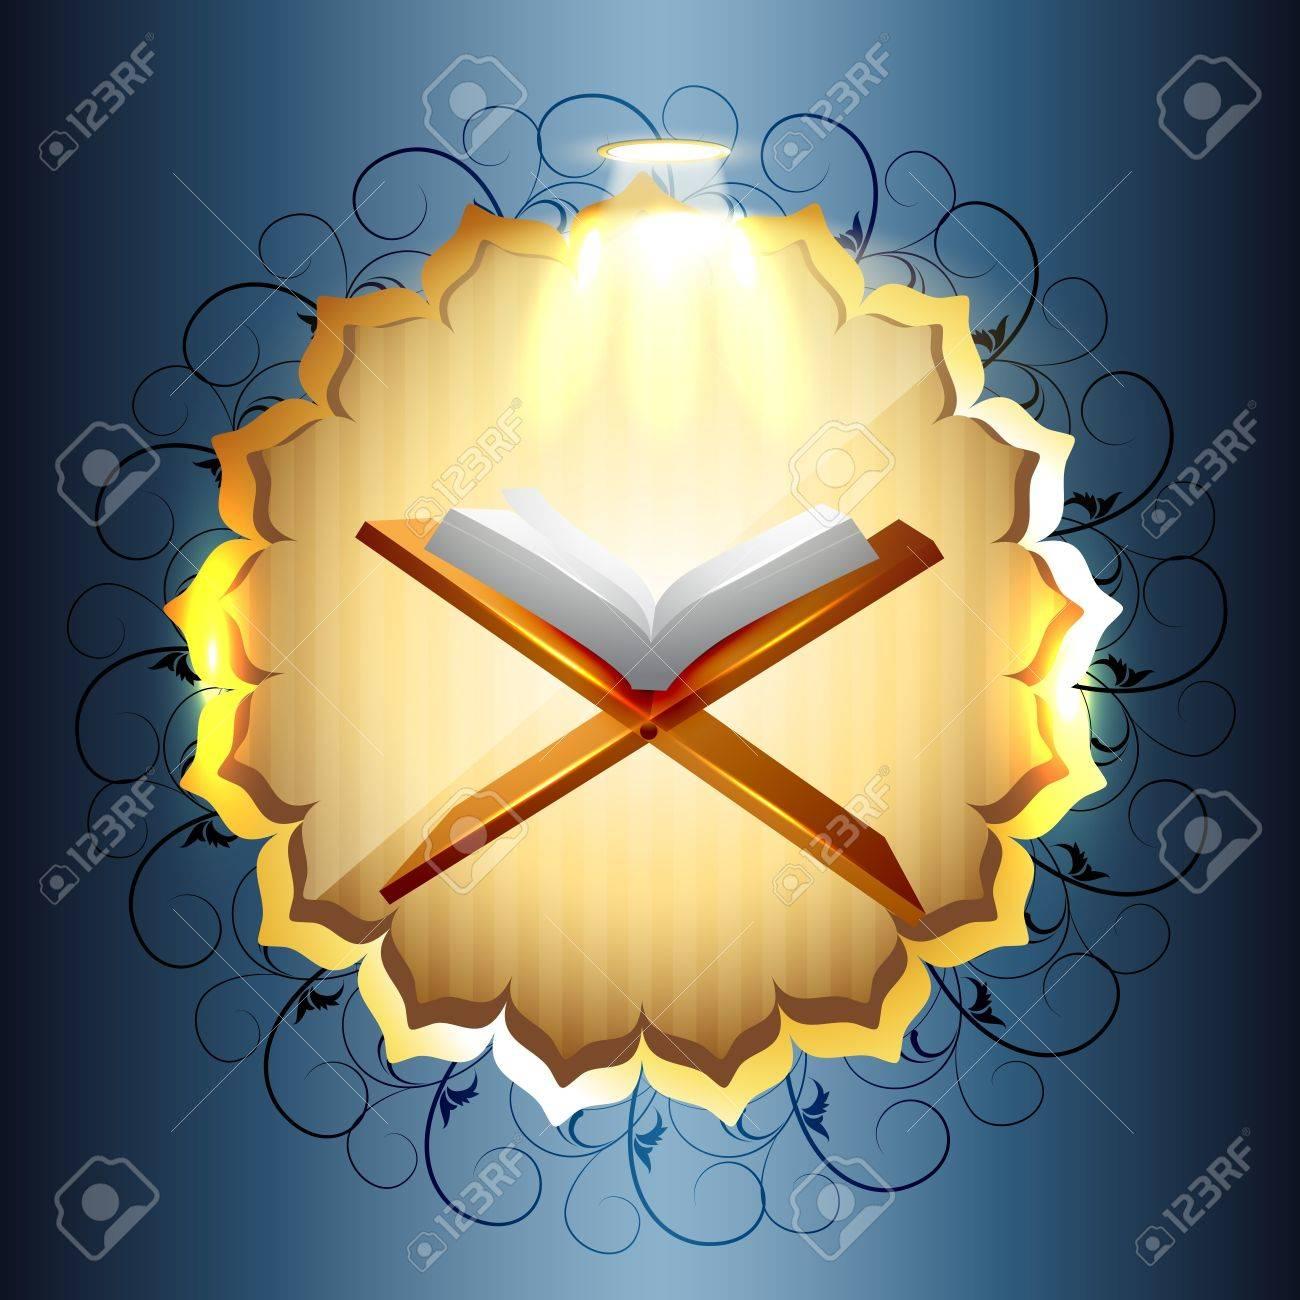 religious book of quraan vector illustration Stock Vector - 14470434